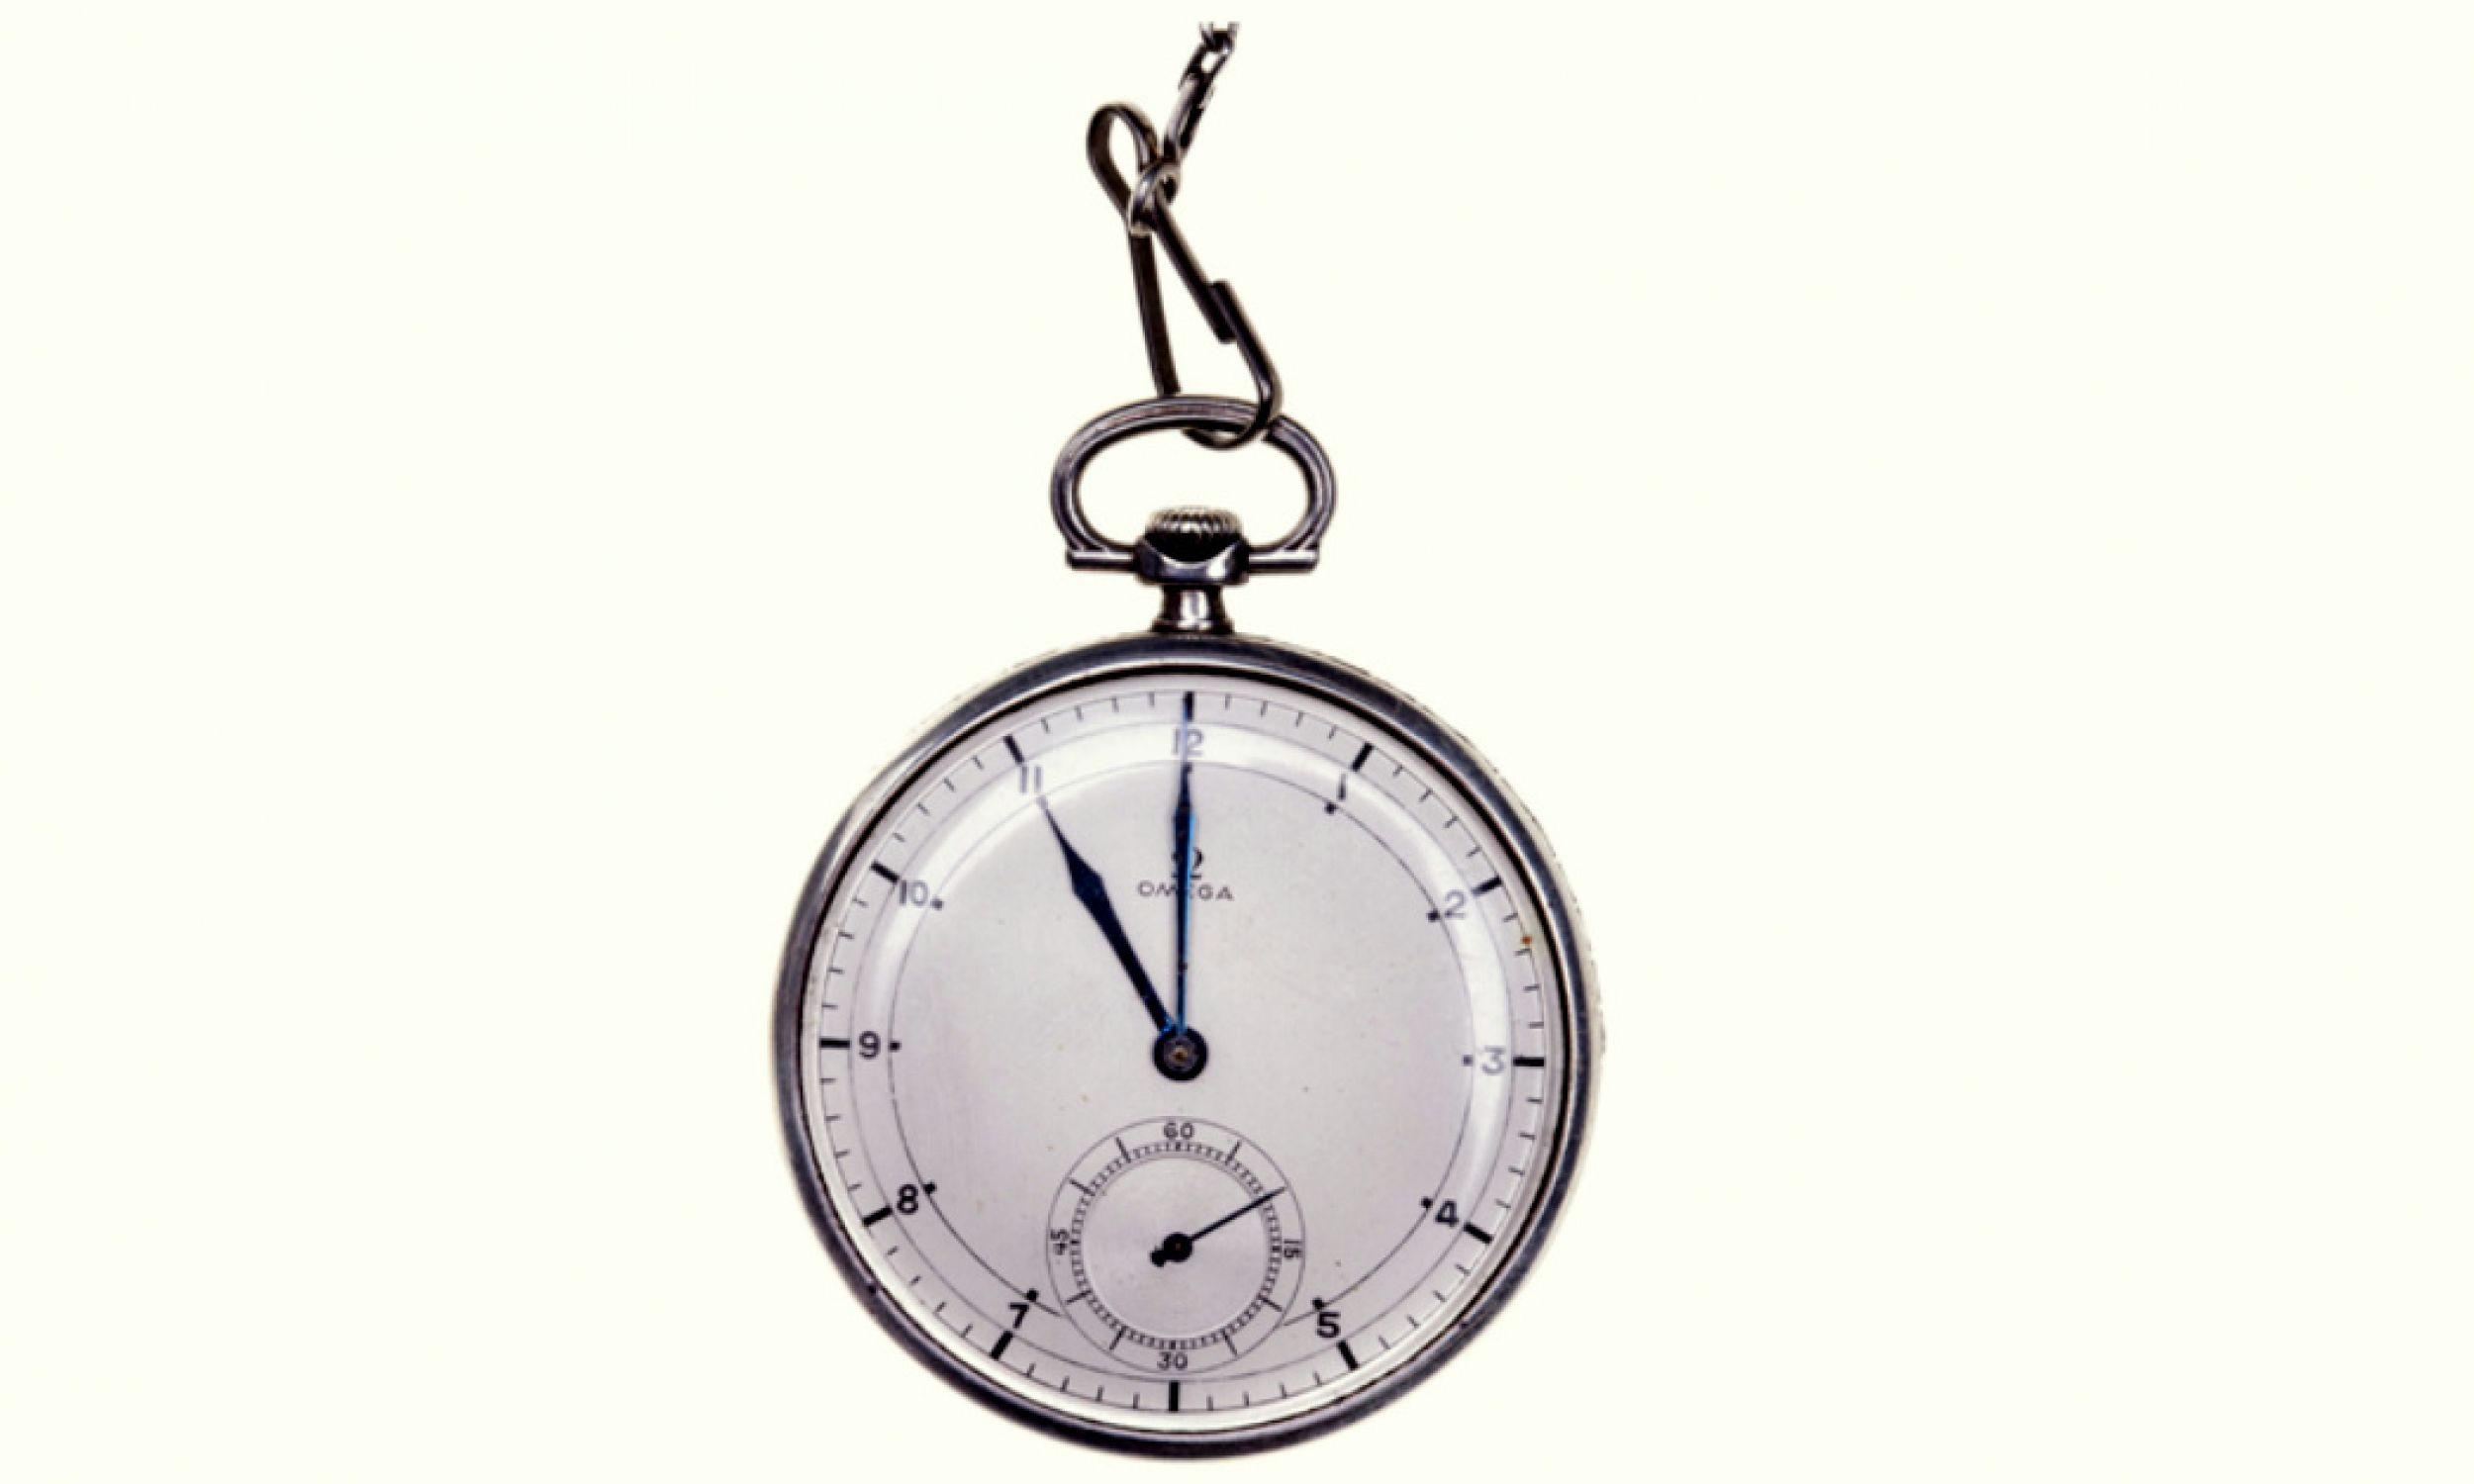 Zegarek Omega w typie art deco. Fot. materiały prasowe DESA Unicum